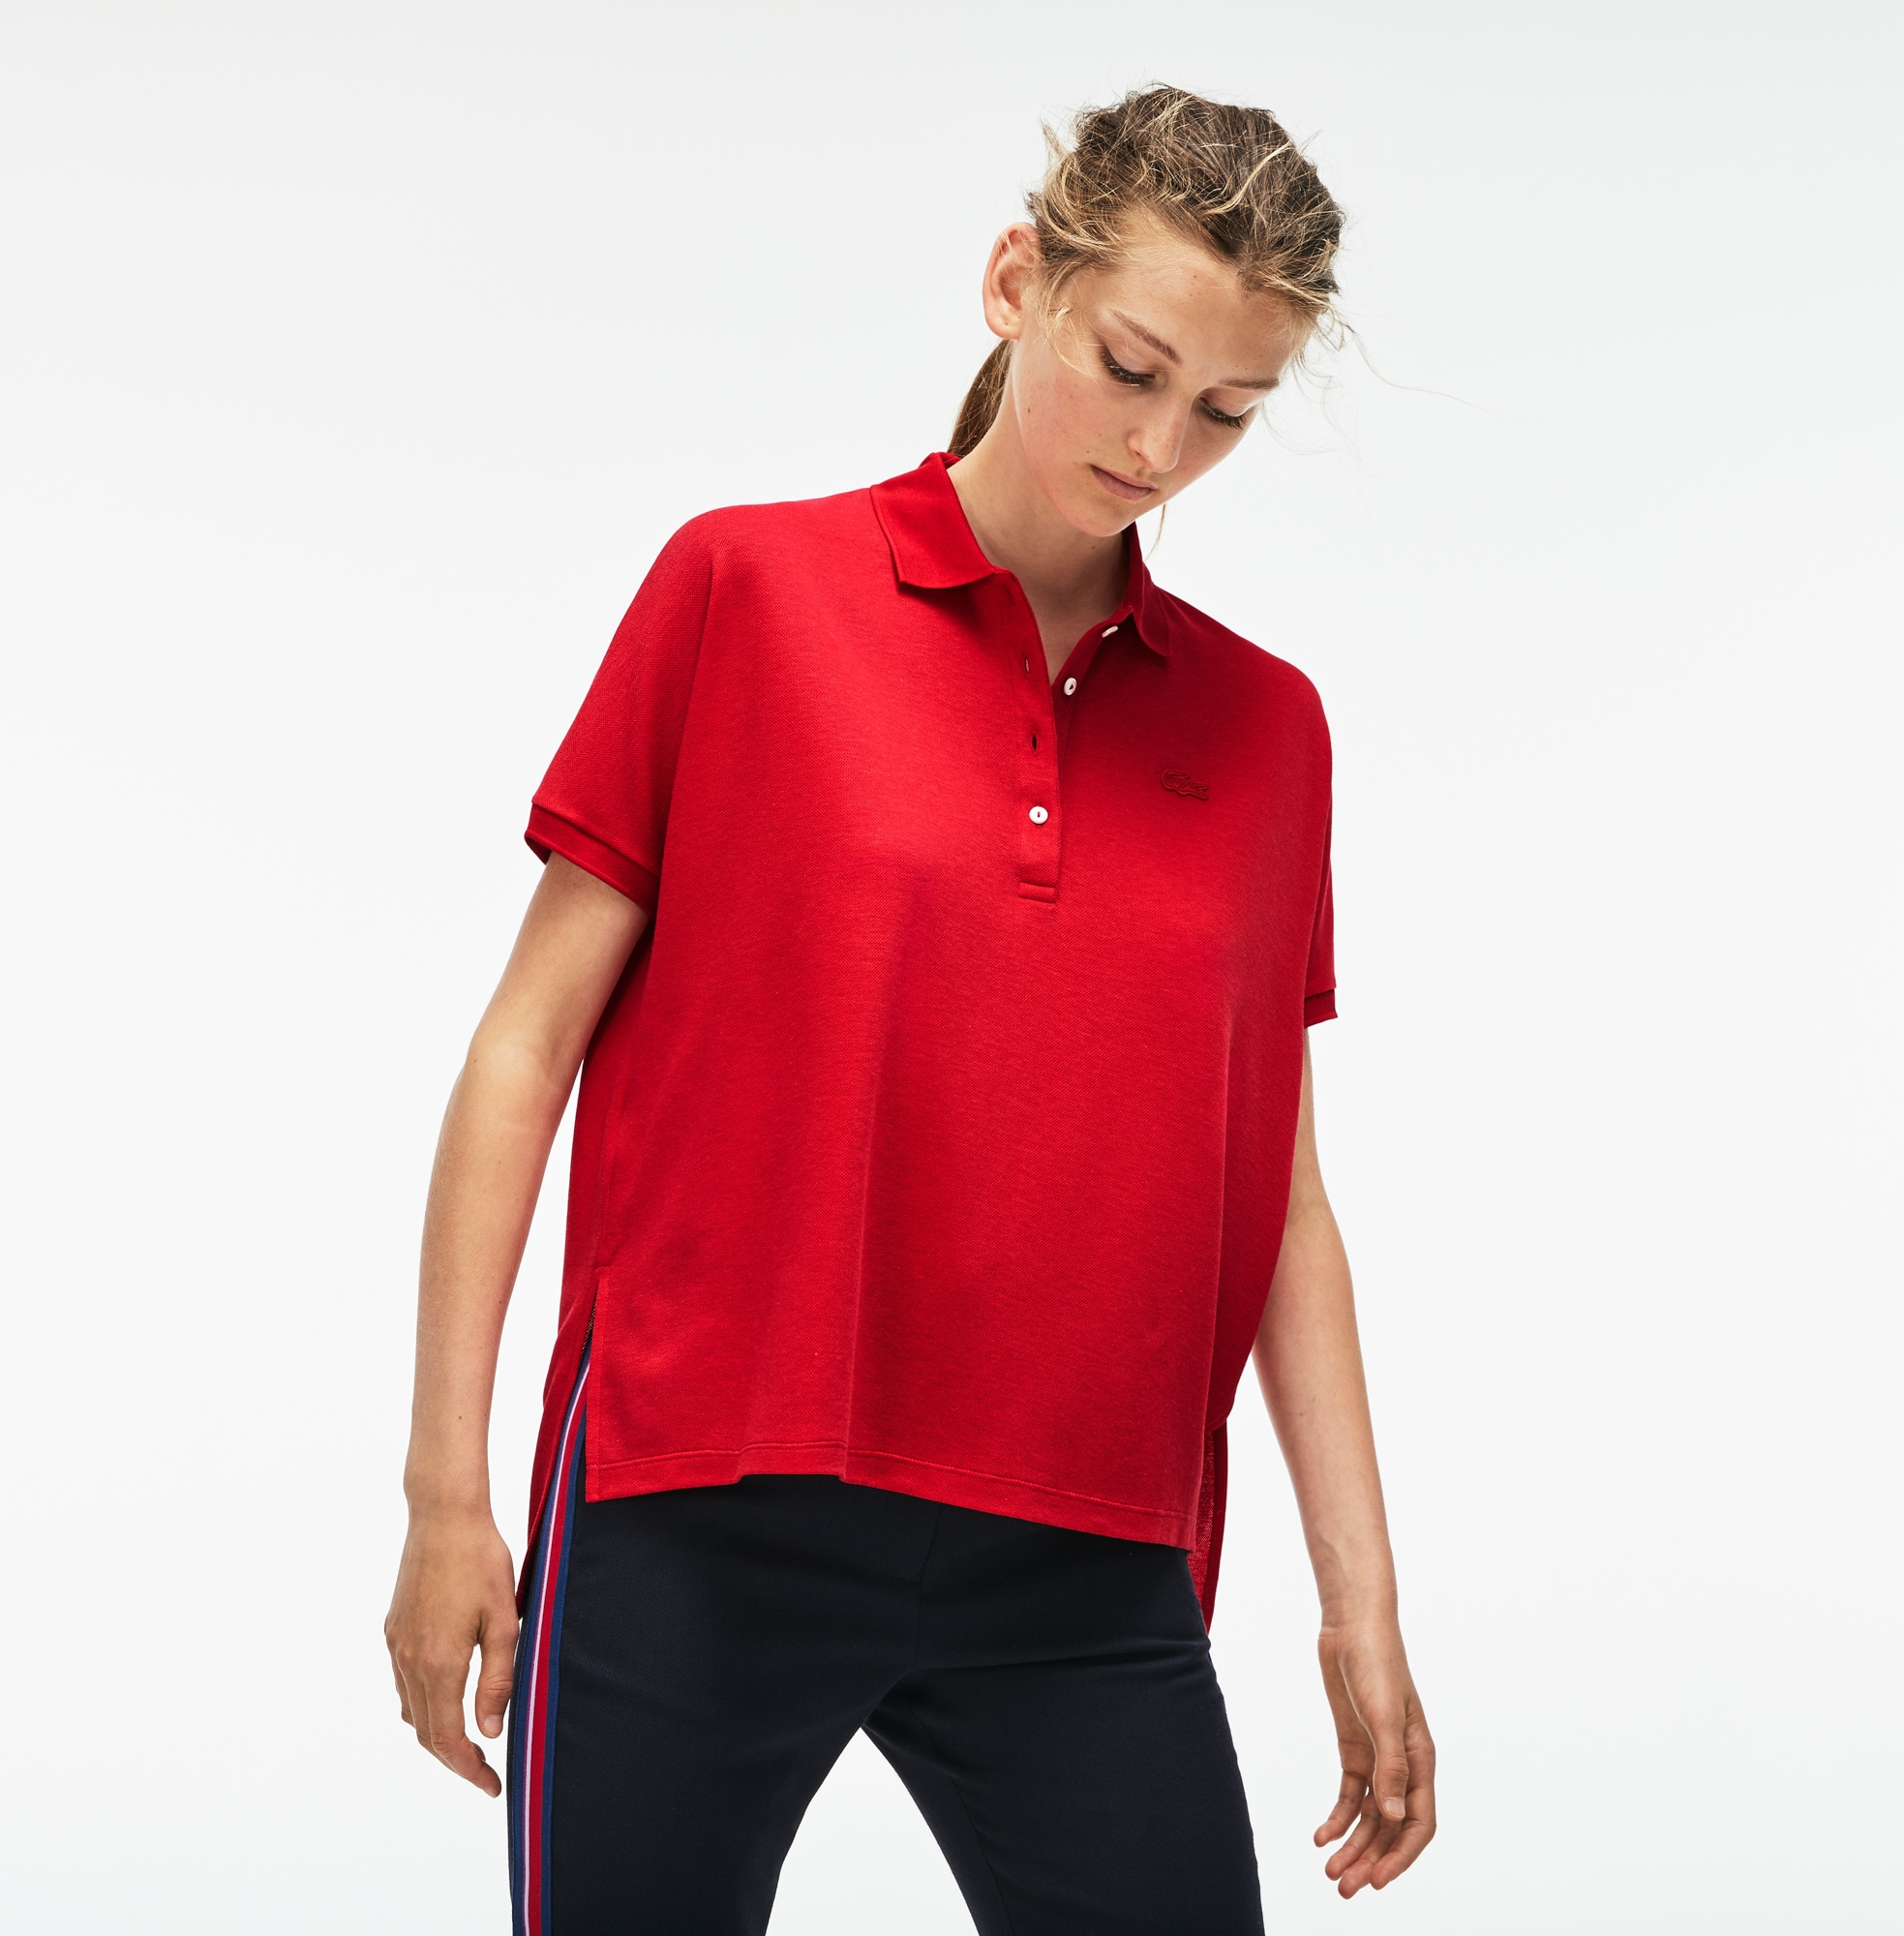 sports shoes 1bff4 ce0c1 Poloshirts für Damen | Damenmode | LACOSTE